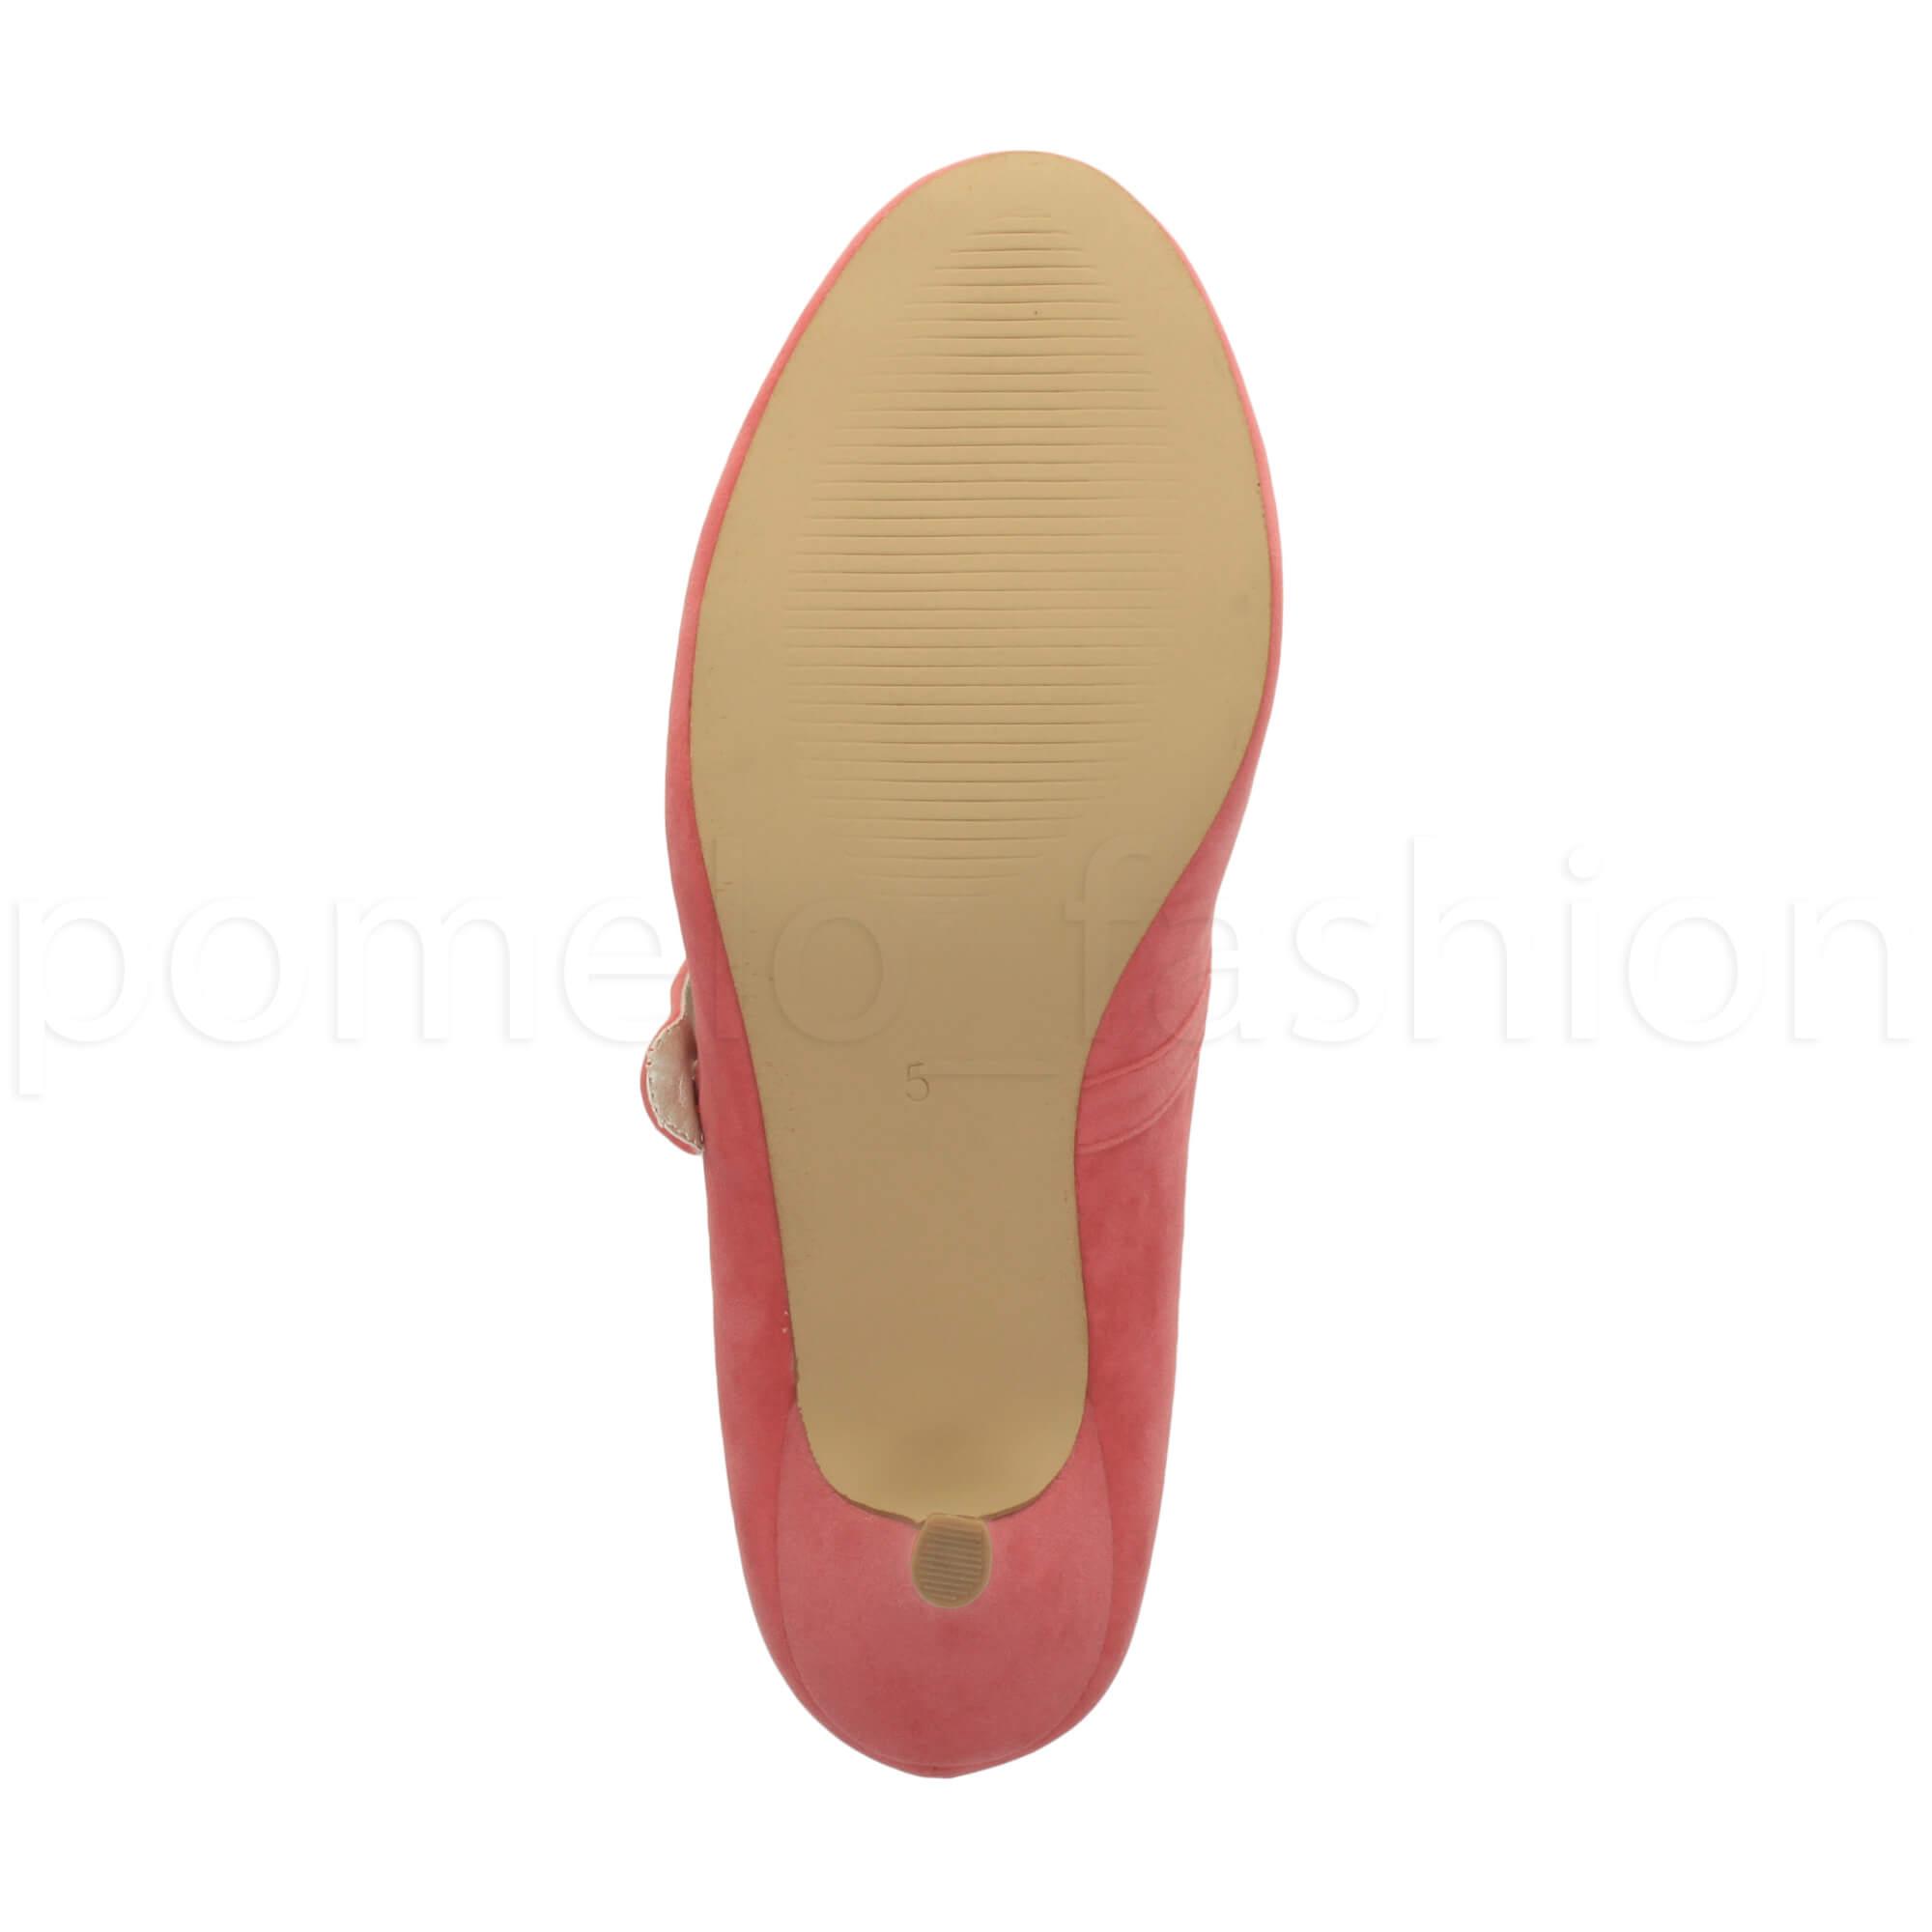 miniatura 57 - Donna basso tacco medio Mary Jane Damigella Matrimonio Pompe Scarpe Da Sera Taglia